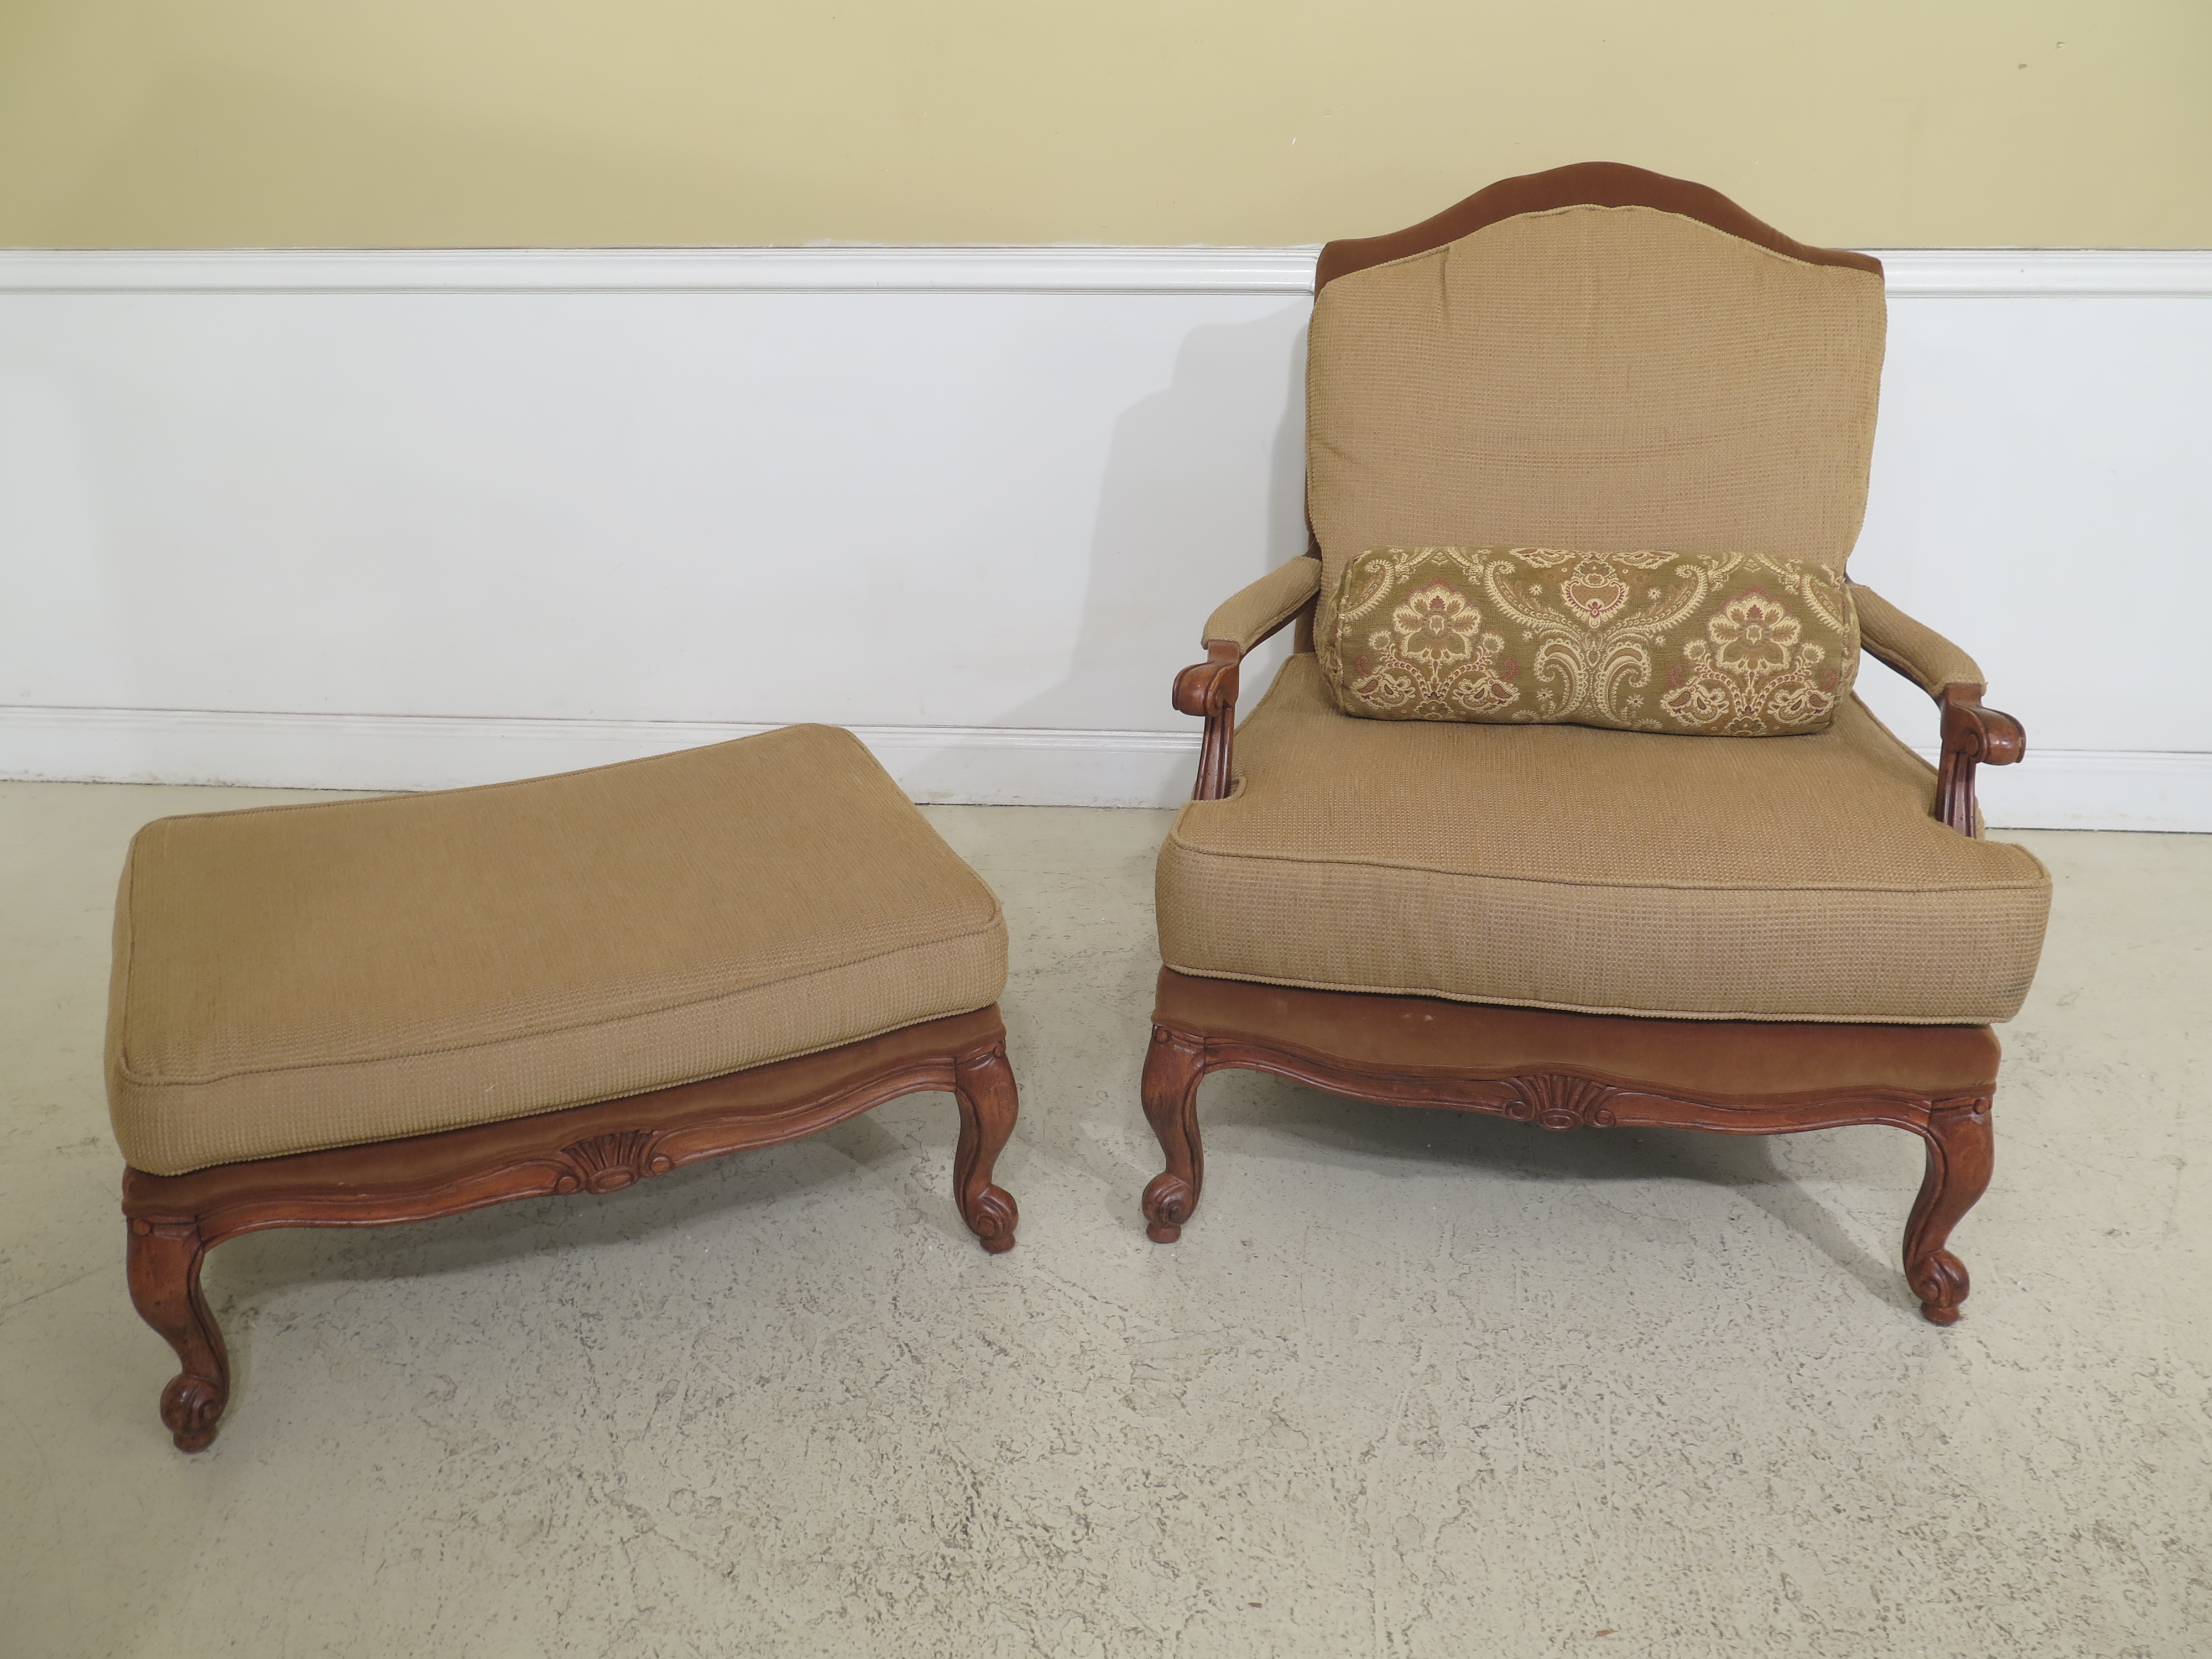 Ethan Allen French Oversized Arm Chair U0026 Ottoman. Circa 2010. High Quality  Construction.